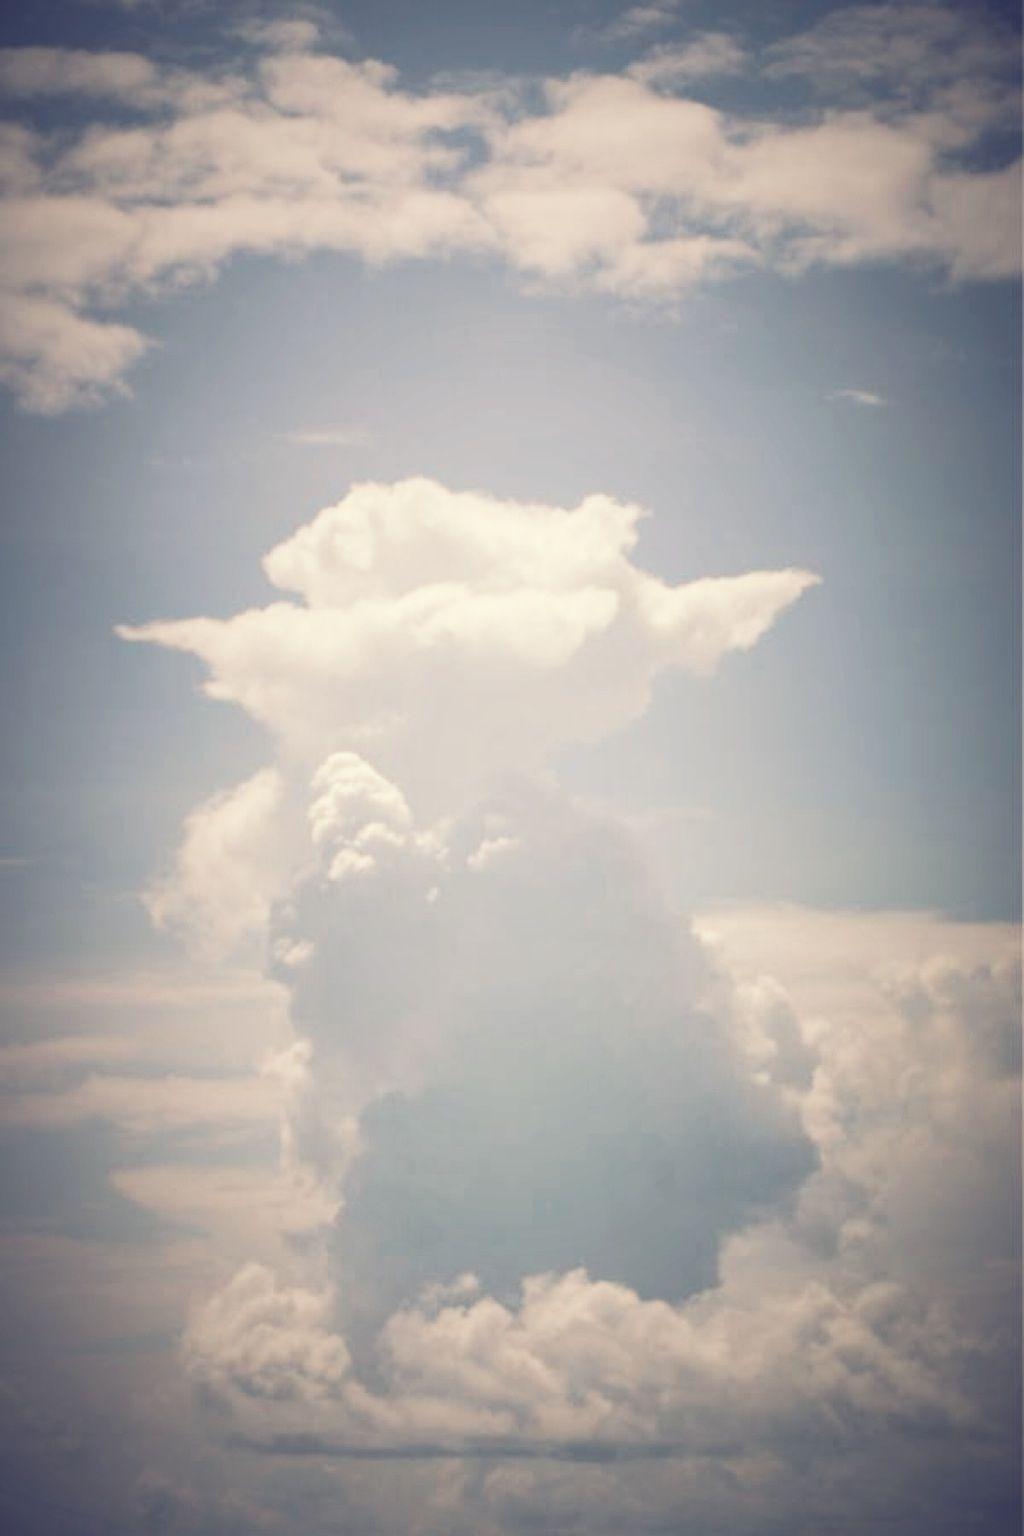 Yoda in the sky!